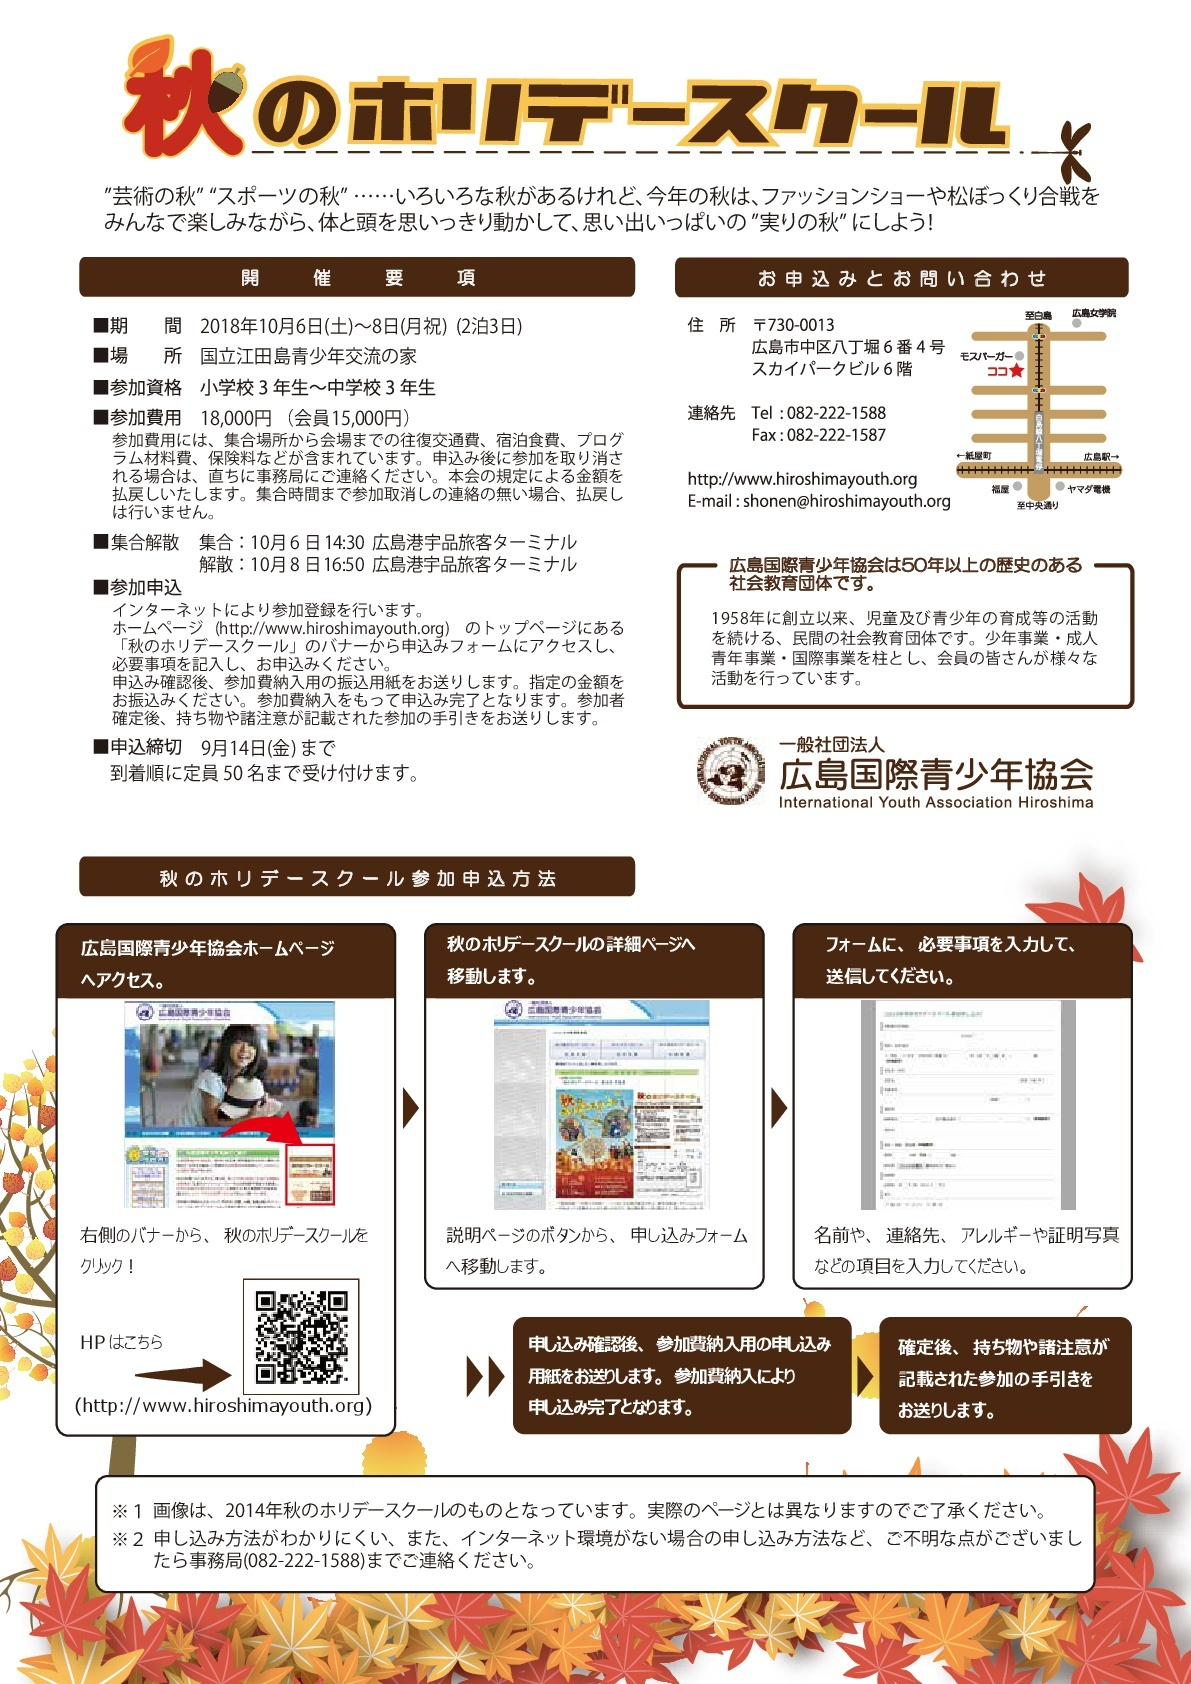 20150928_AHS2018パンフ裏_HP用-001.jpg